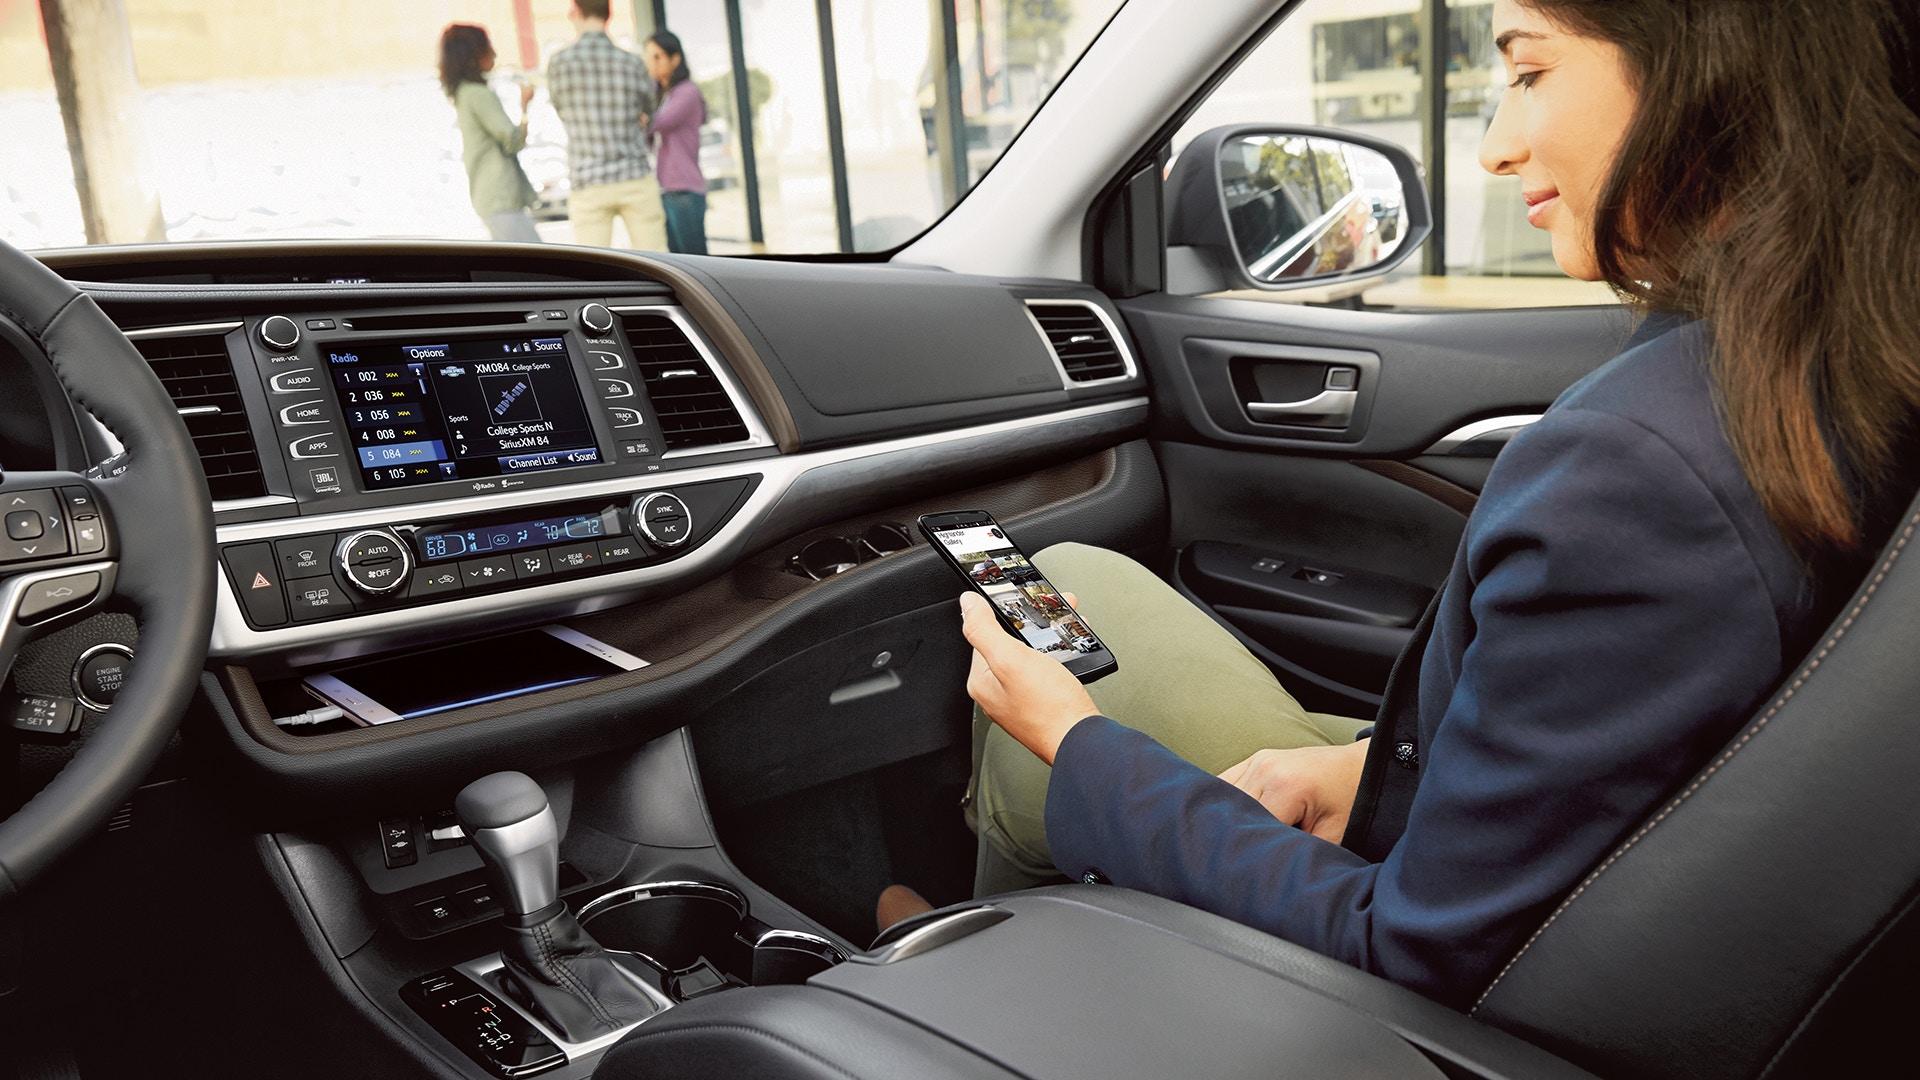 2019 Toyota Highlander Technology